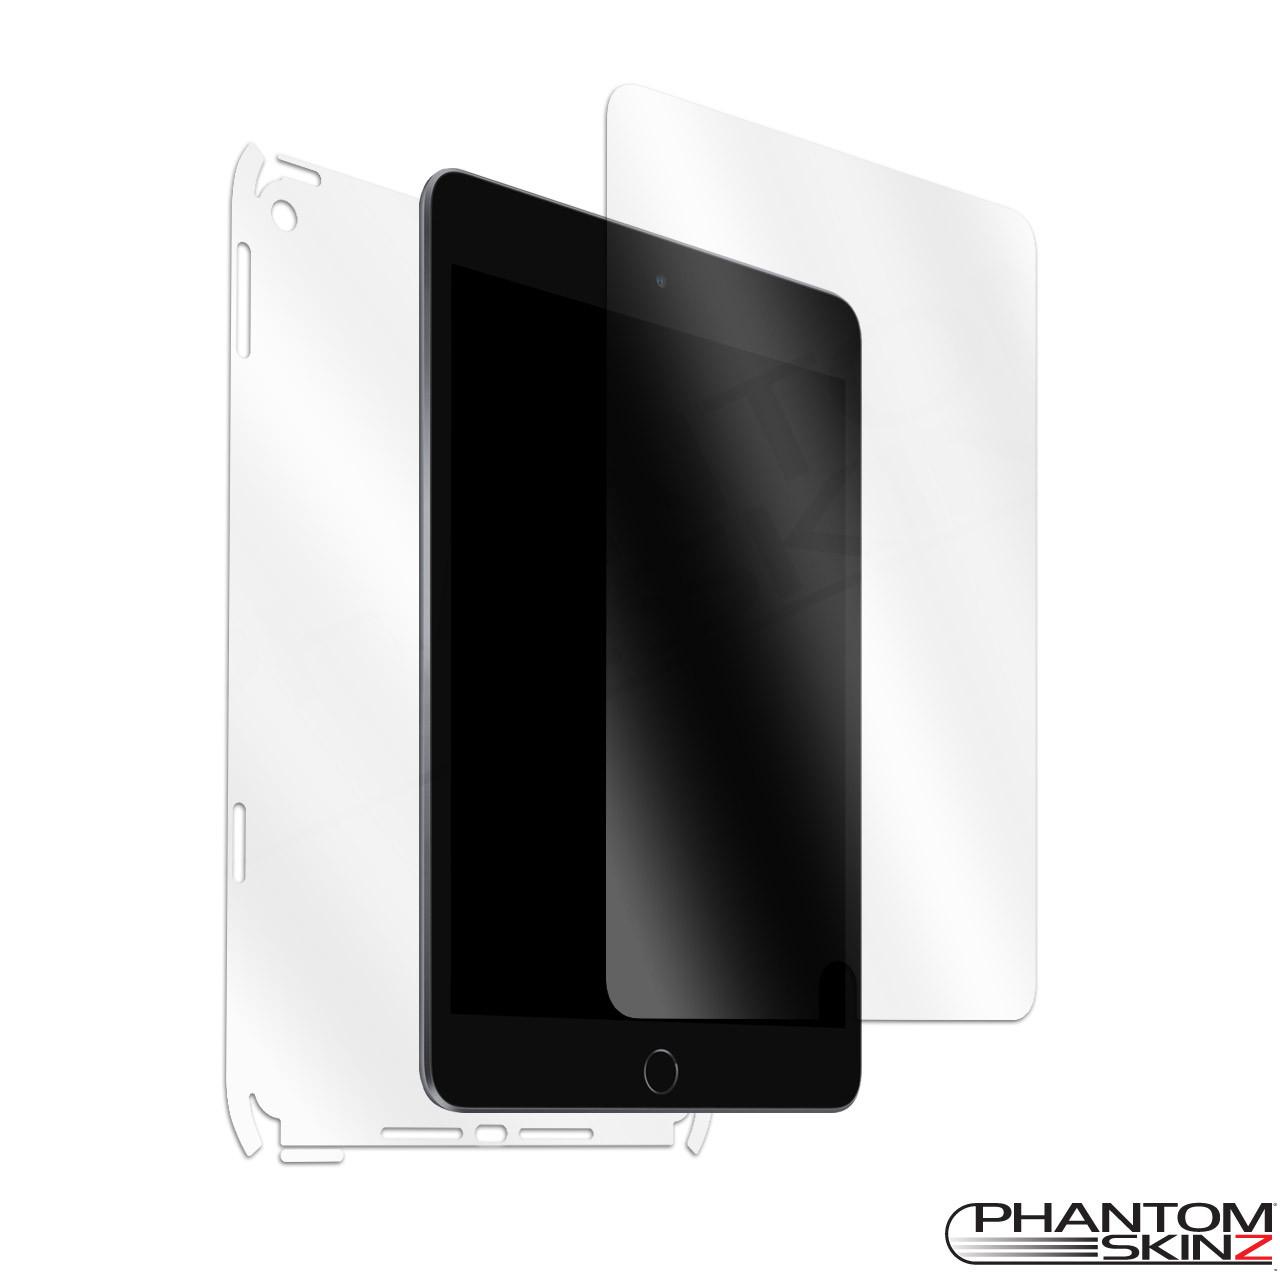 ipad screen is white